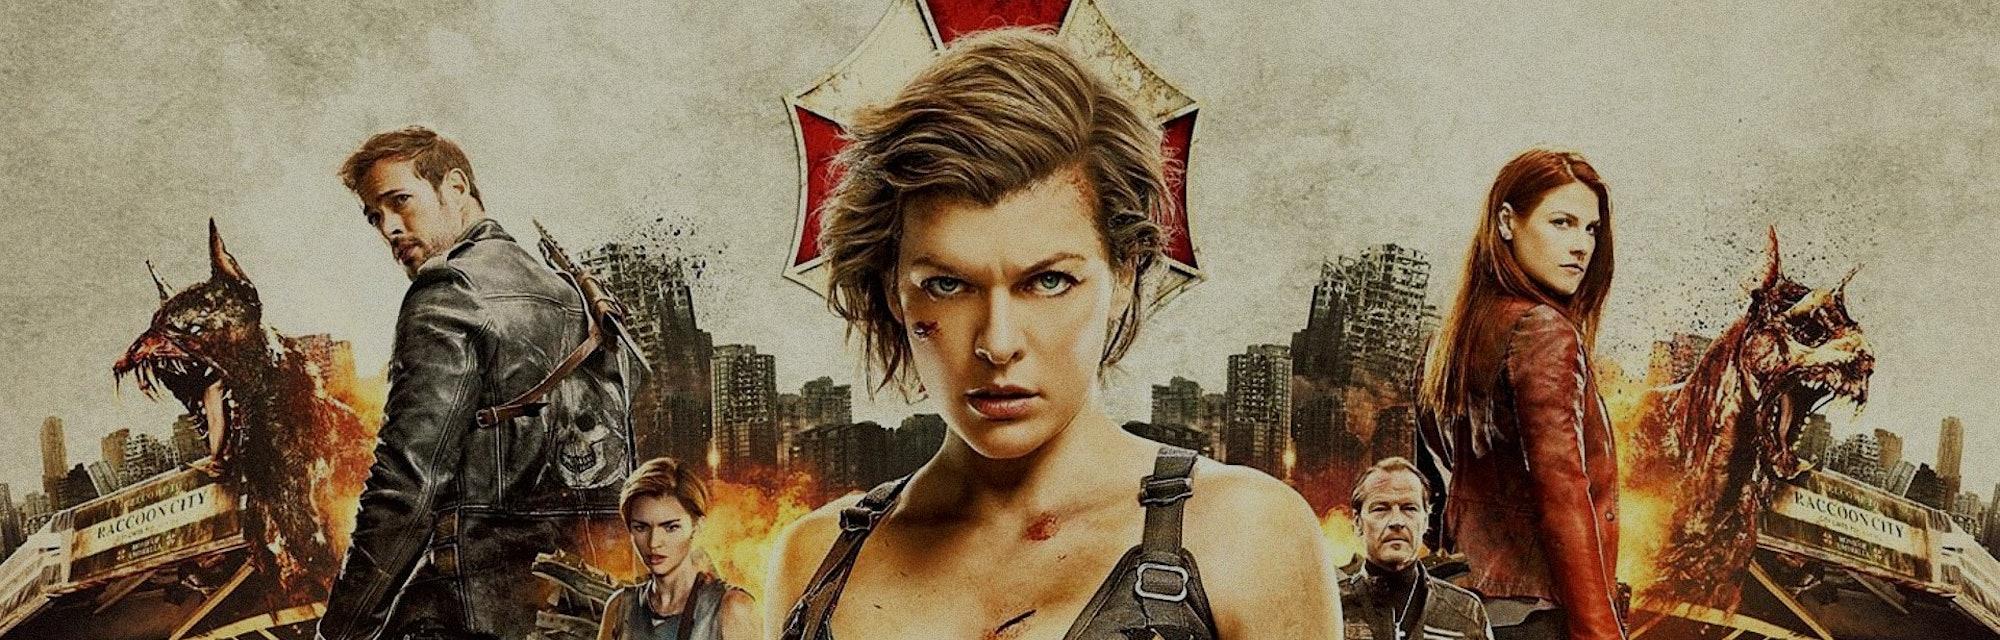 7 Easter Eggs In Resident Evil The Final Chapter